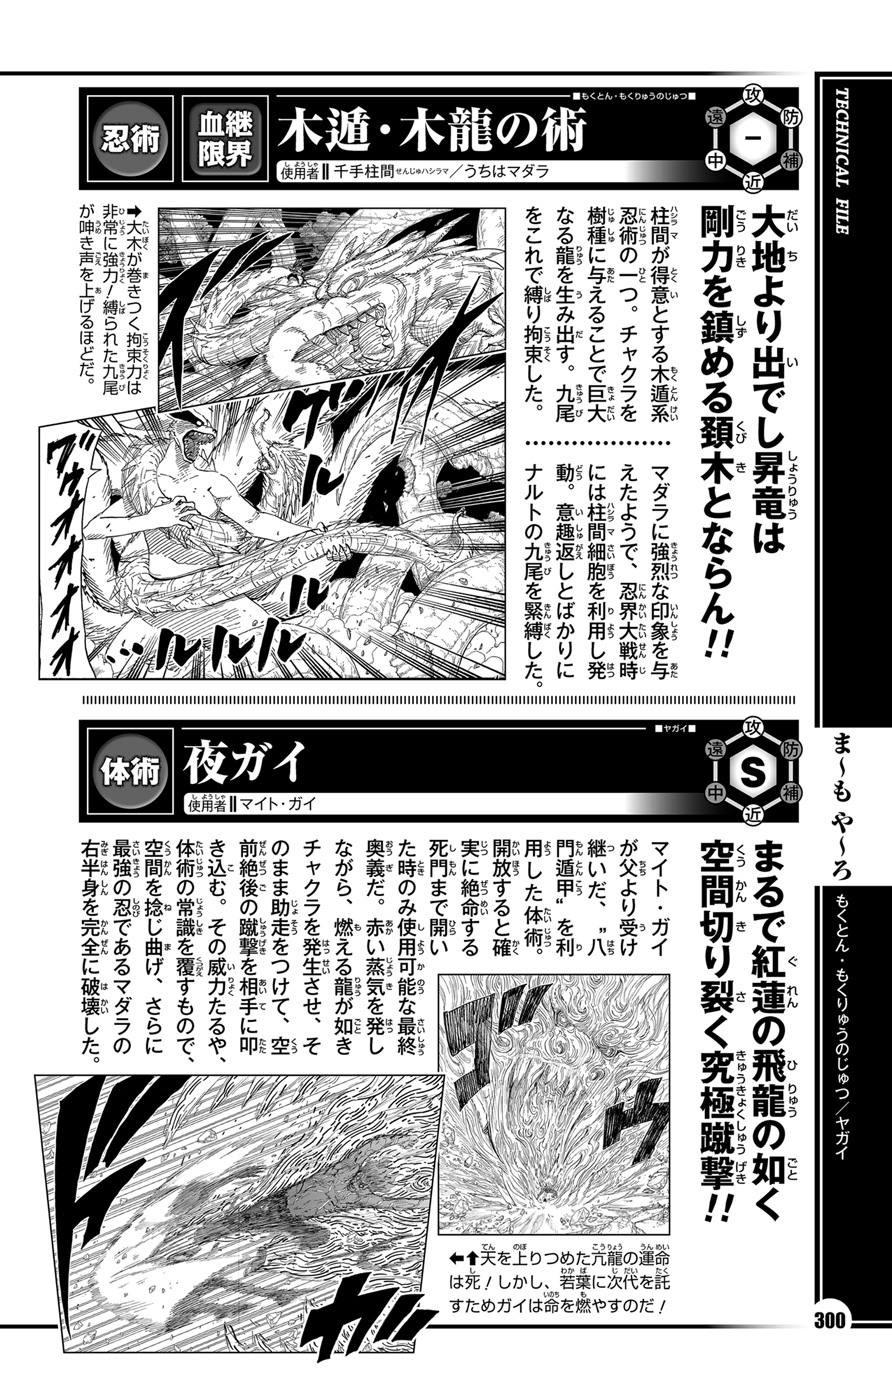 Quantos Akatsukis Killer Bee vence? Qihhk610